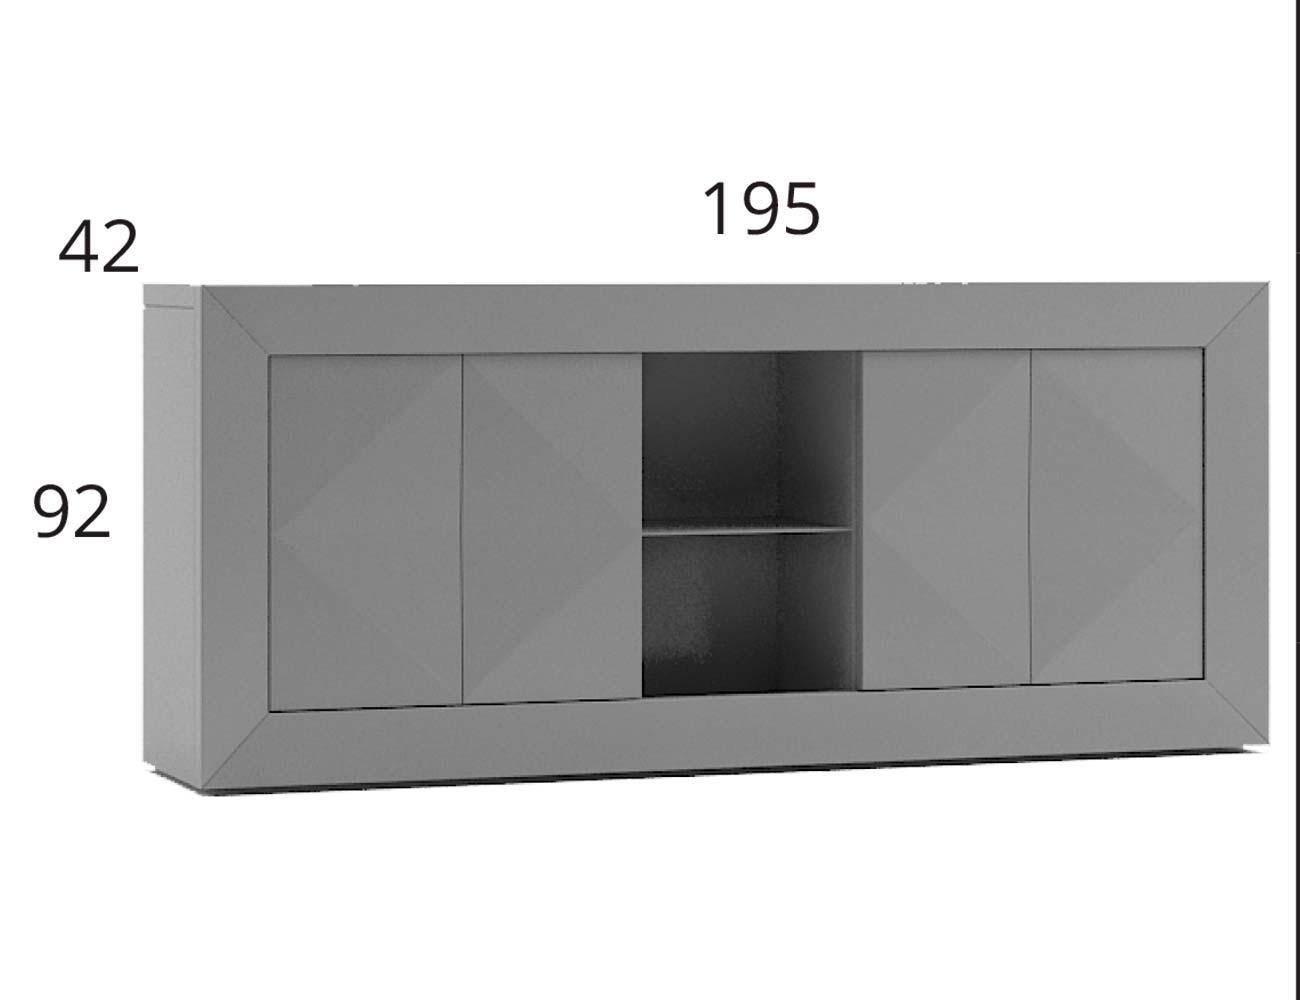 A0351